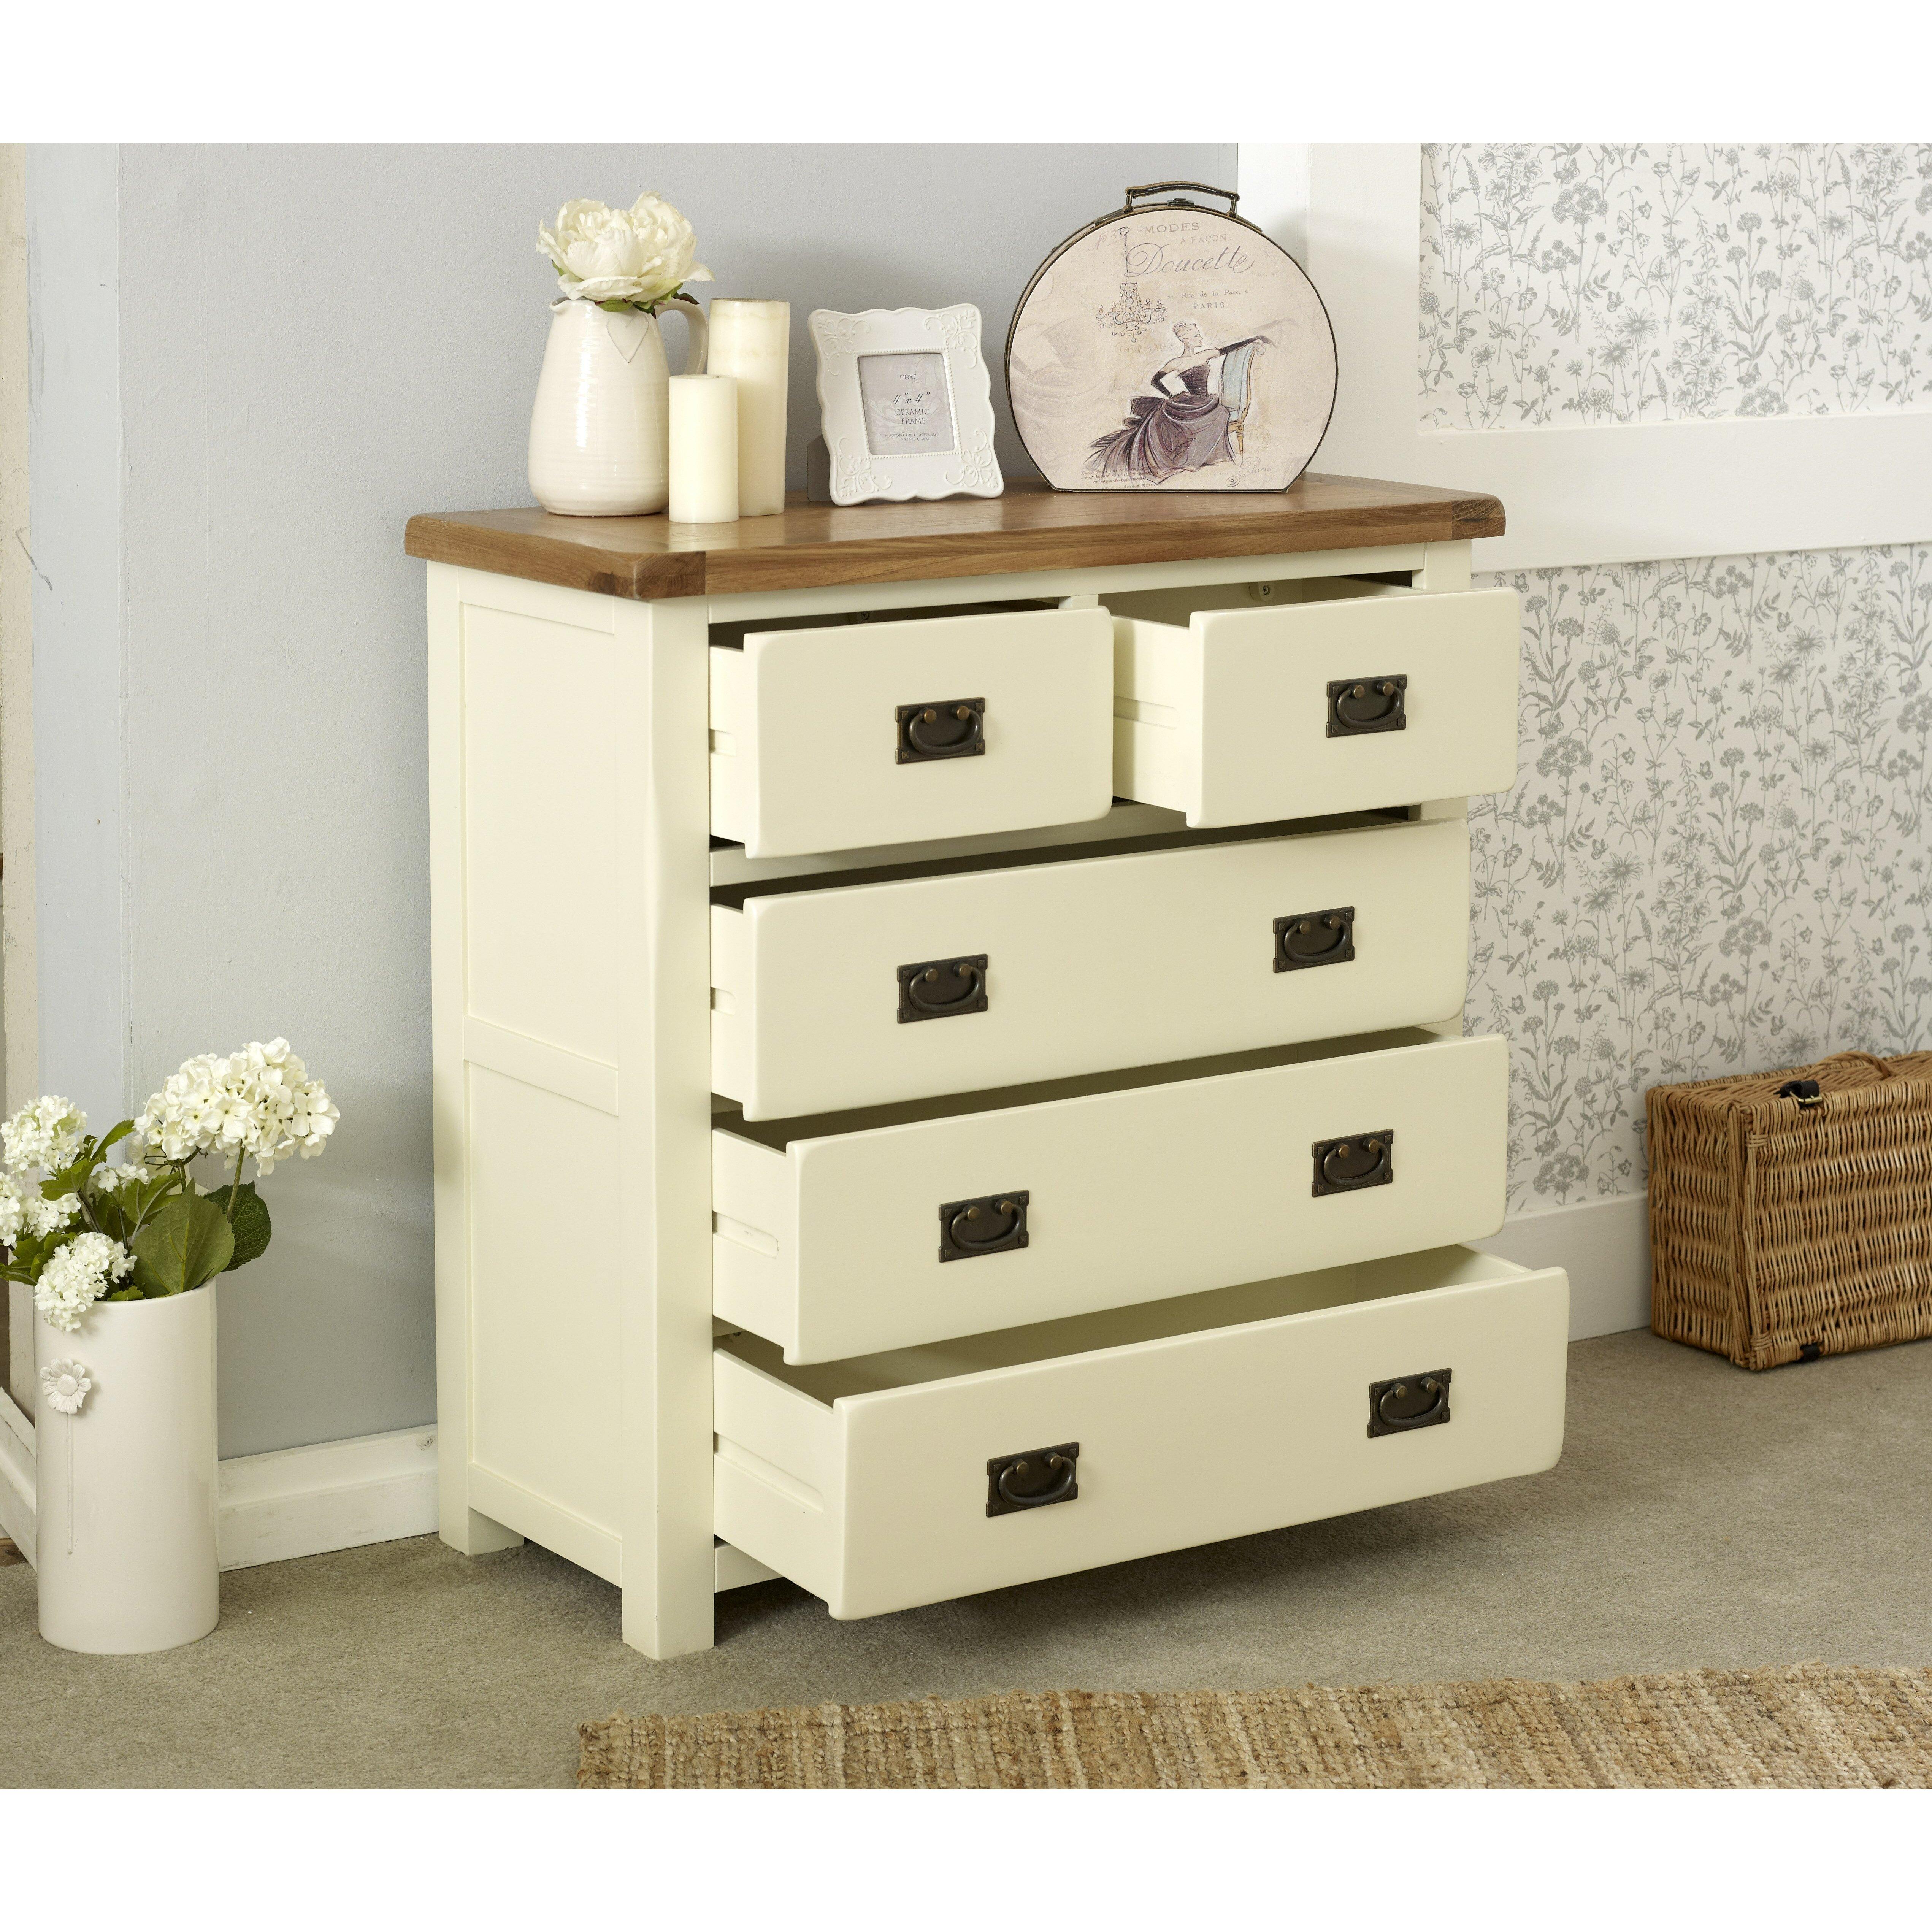 birlea new hampshire 5 drawer chest of drawers wayfair uk. Black Bedroom Furniture Sets. Home Design Ideas